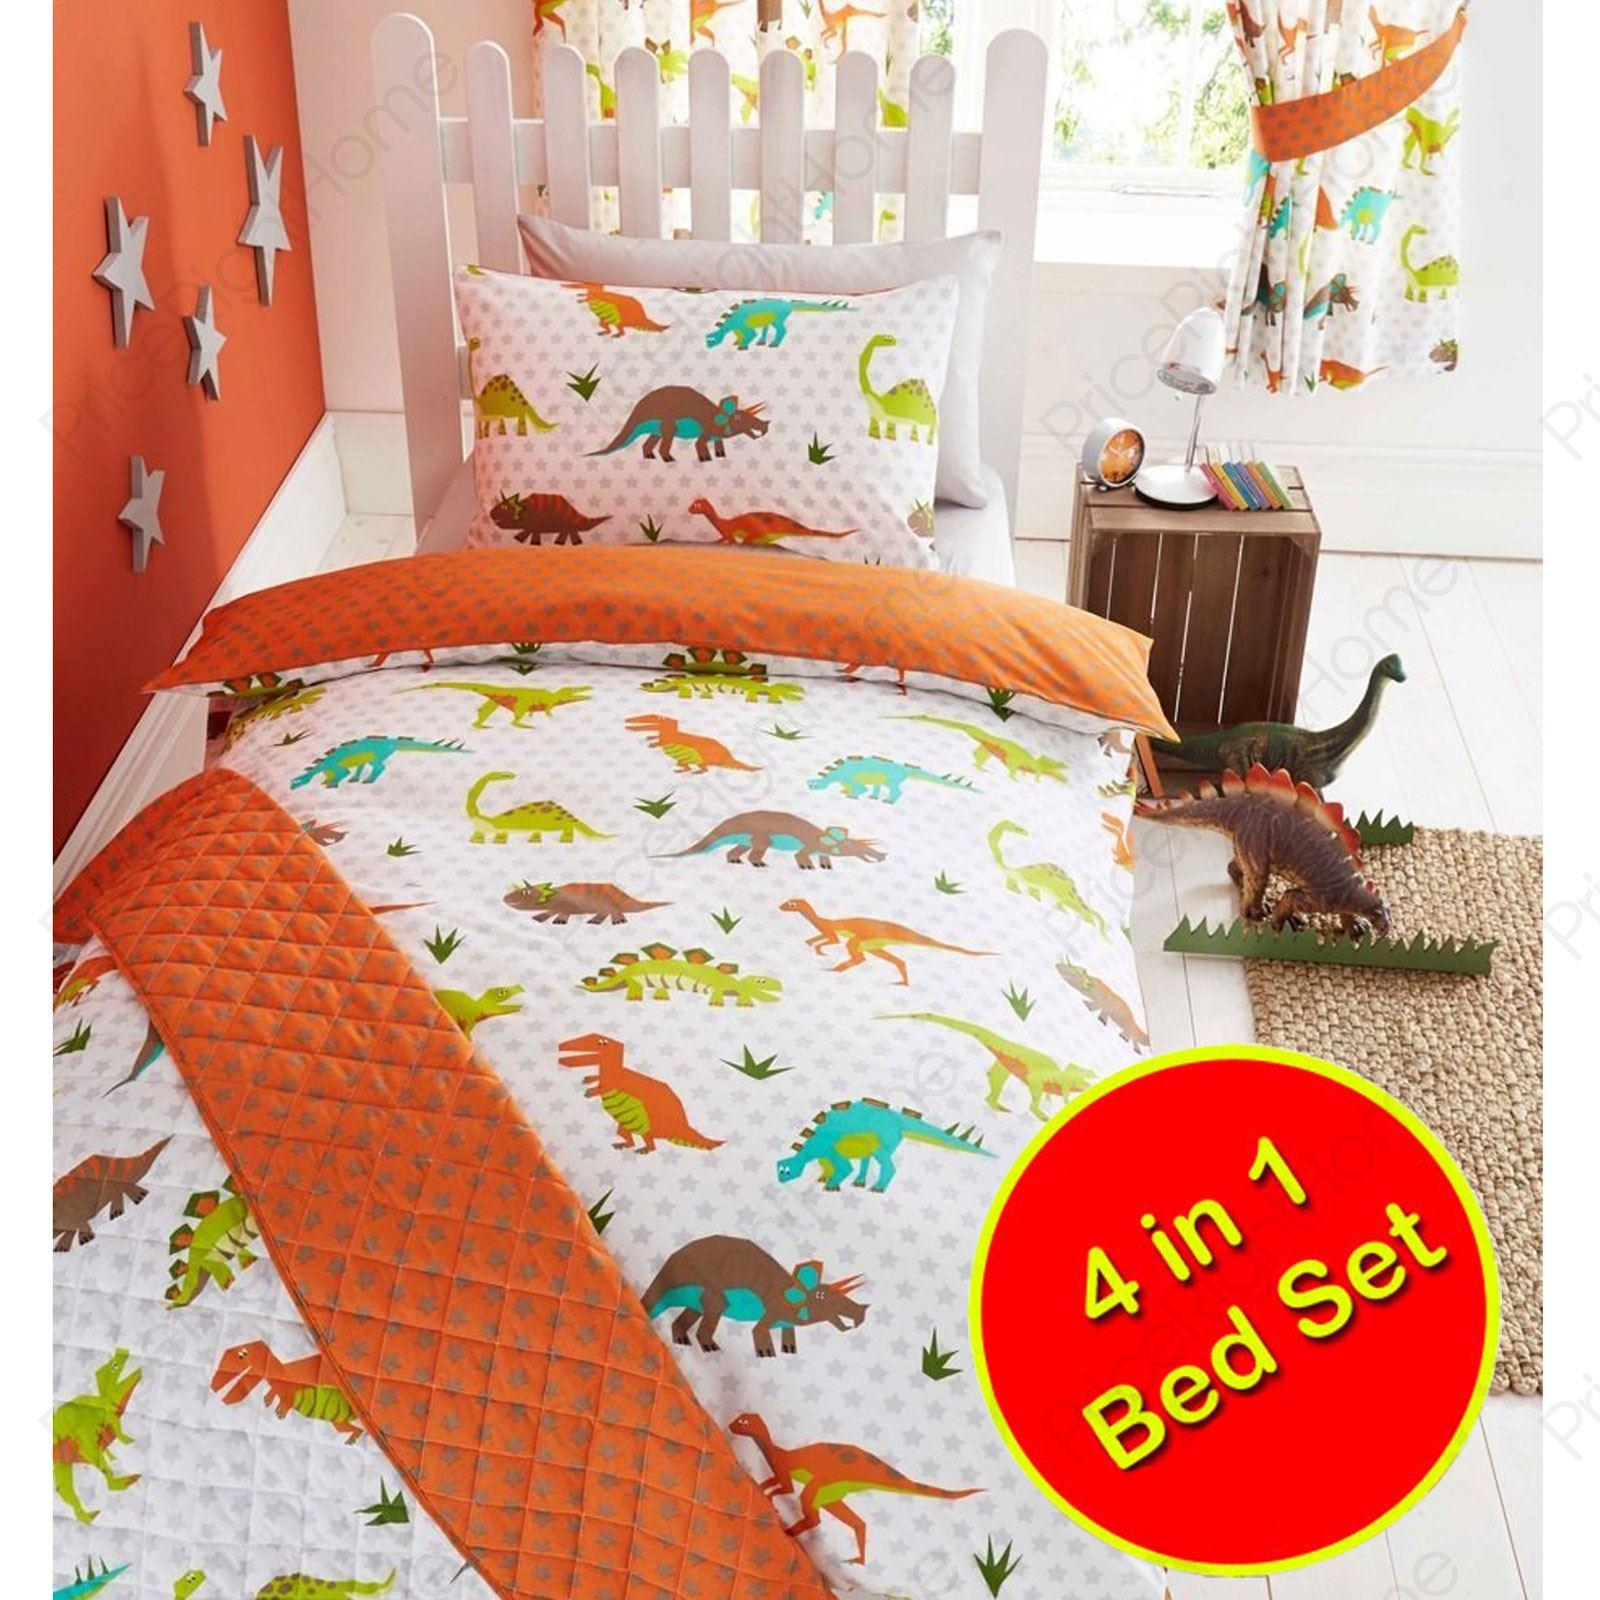 Prehistoric Dinosaur 4 In 1 Toddler Bed Bedding Bundle